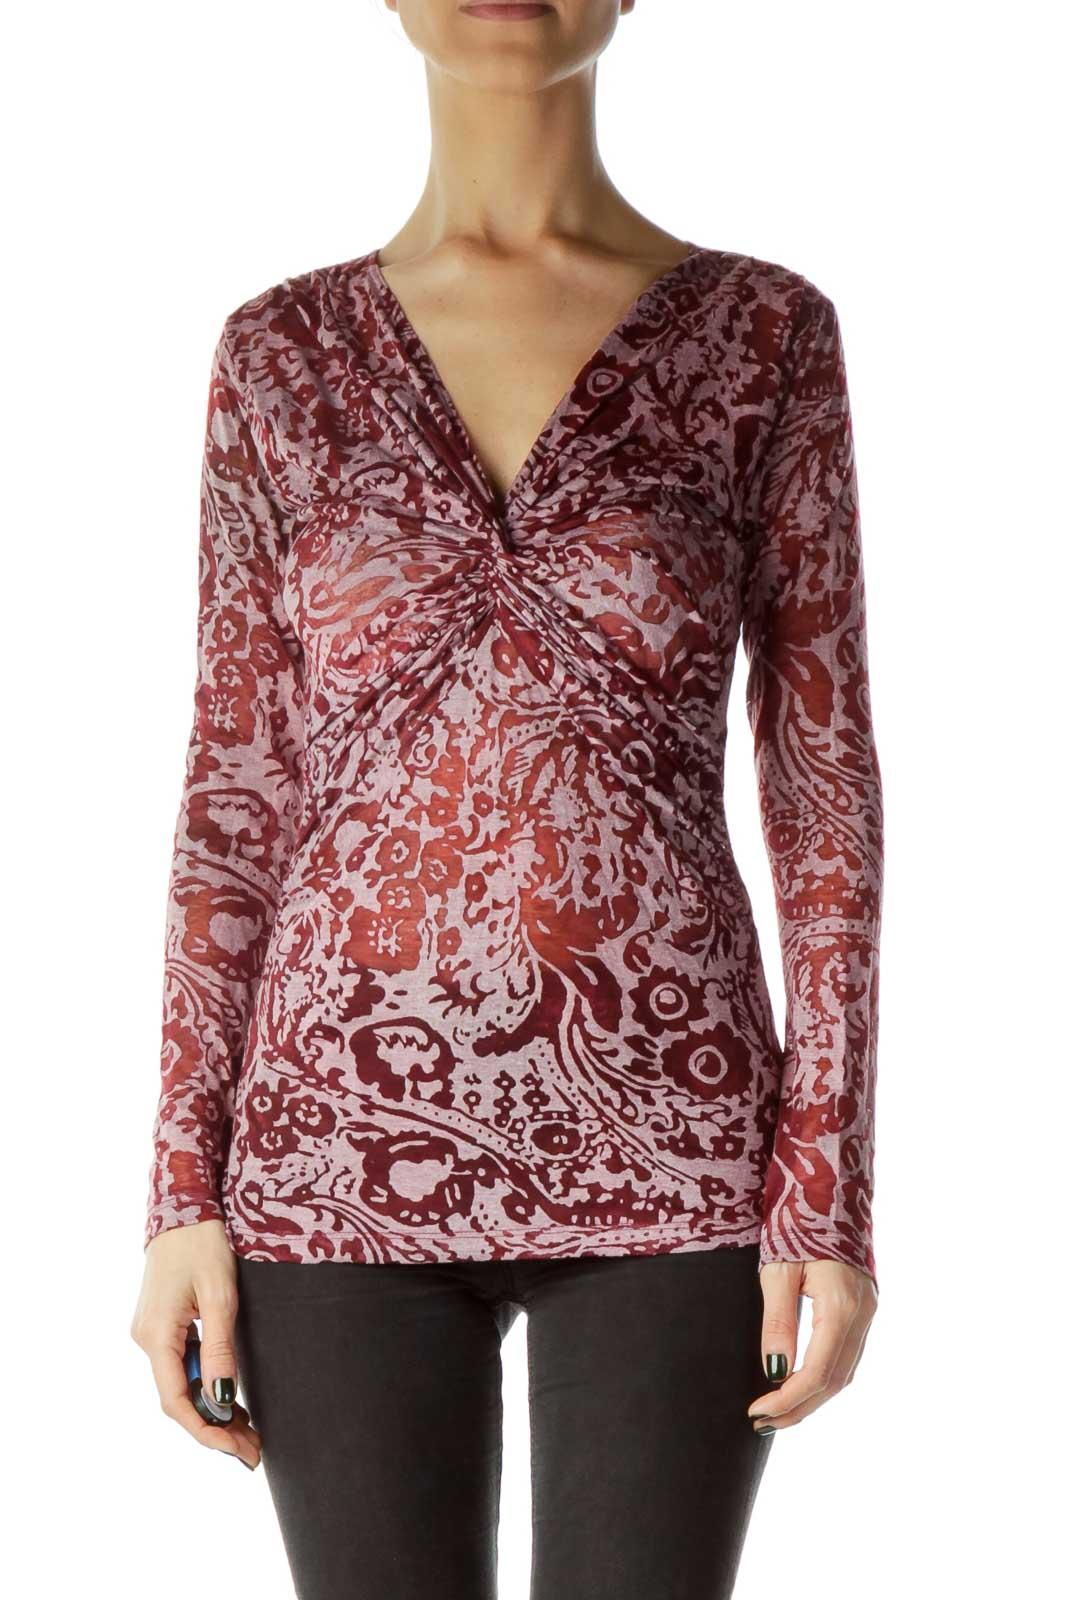 Red Sheer Printed Long Sleeve top Front